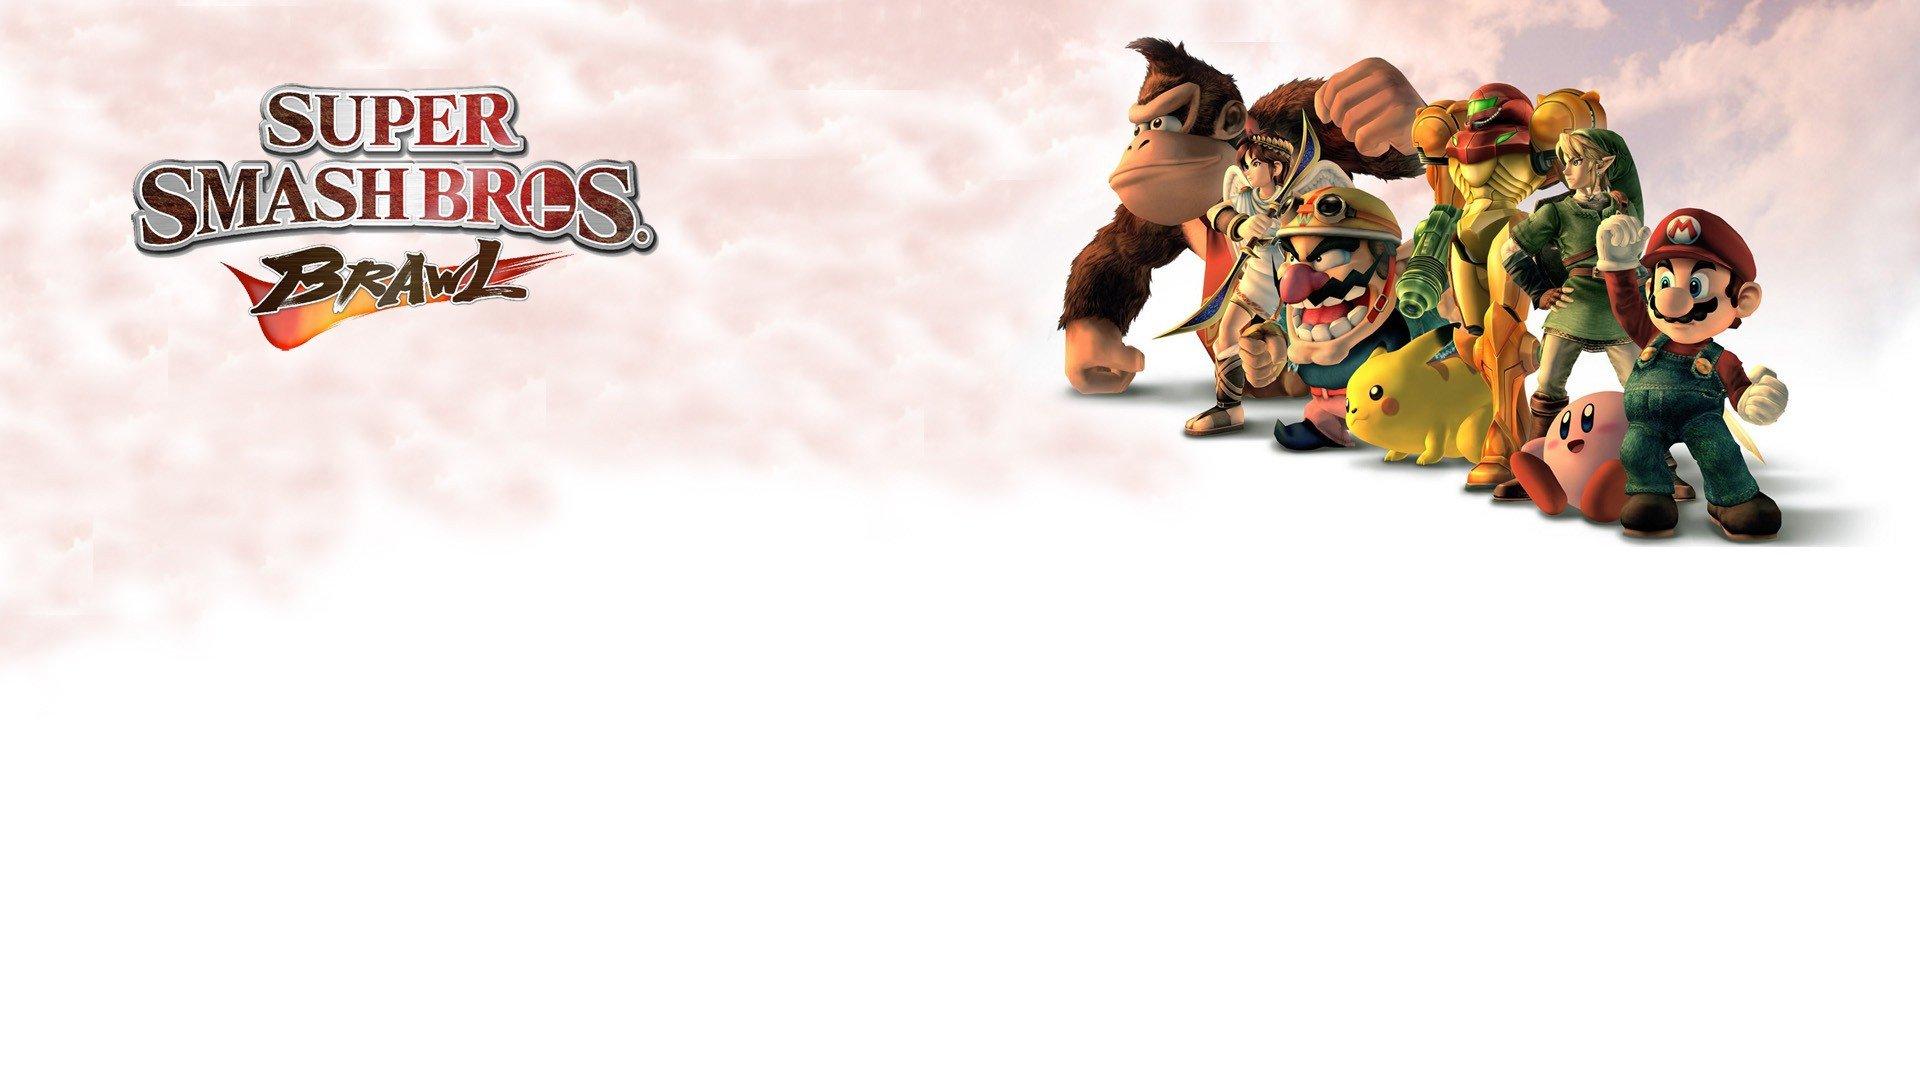 Super Smash Bros Brawl Wallpapers 1920x1080 Full Hd 1080p